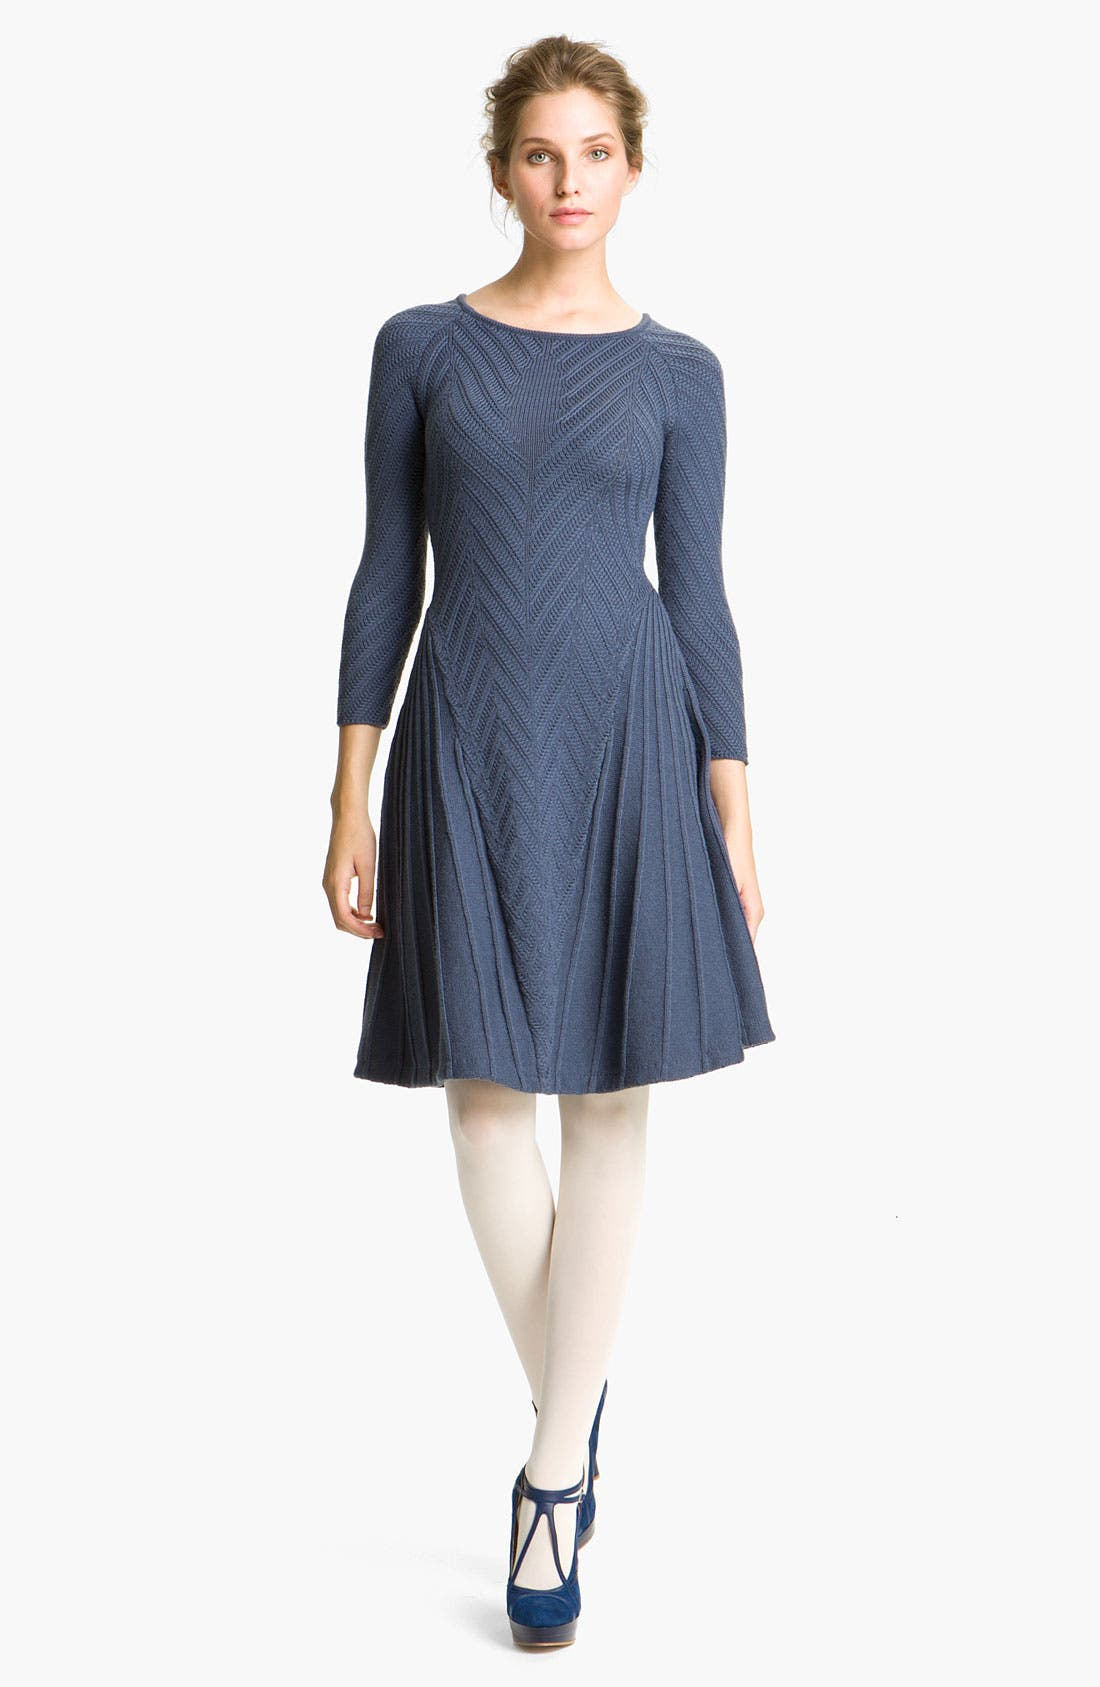 Main Image - Cacharel Chevron Knit Dress